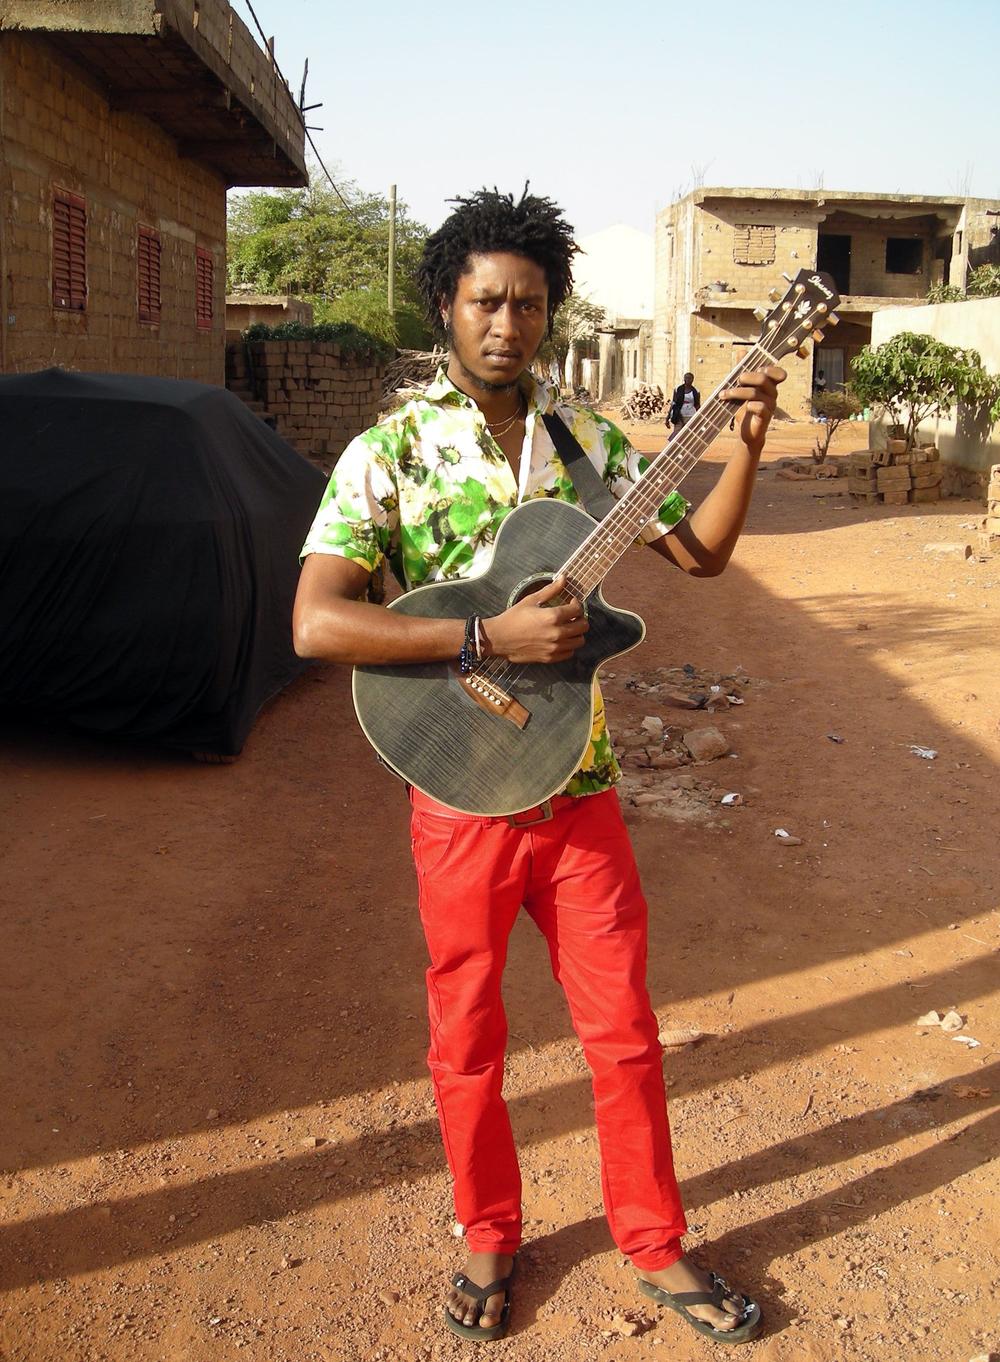 Mohamed Babsy Toure